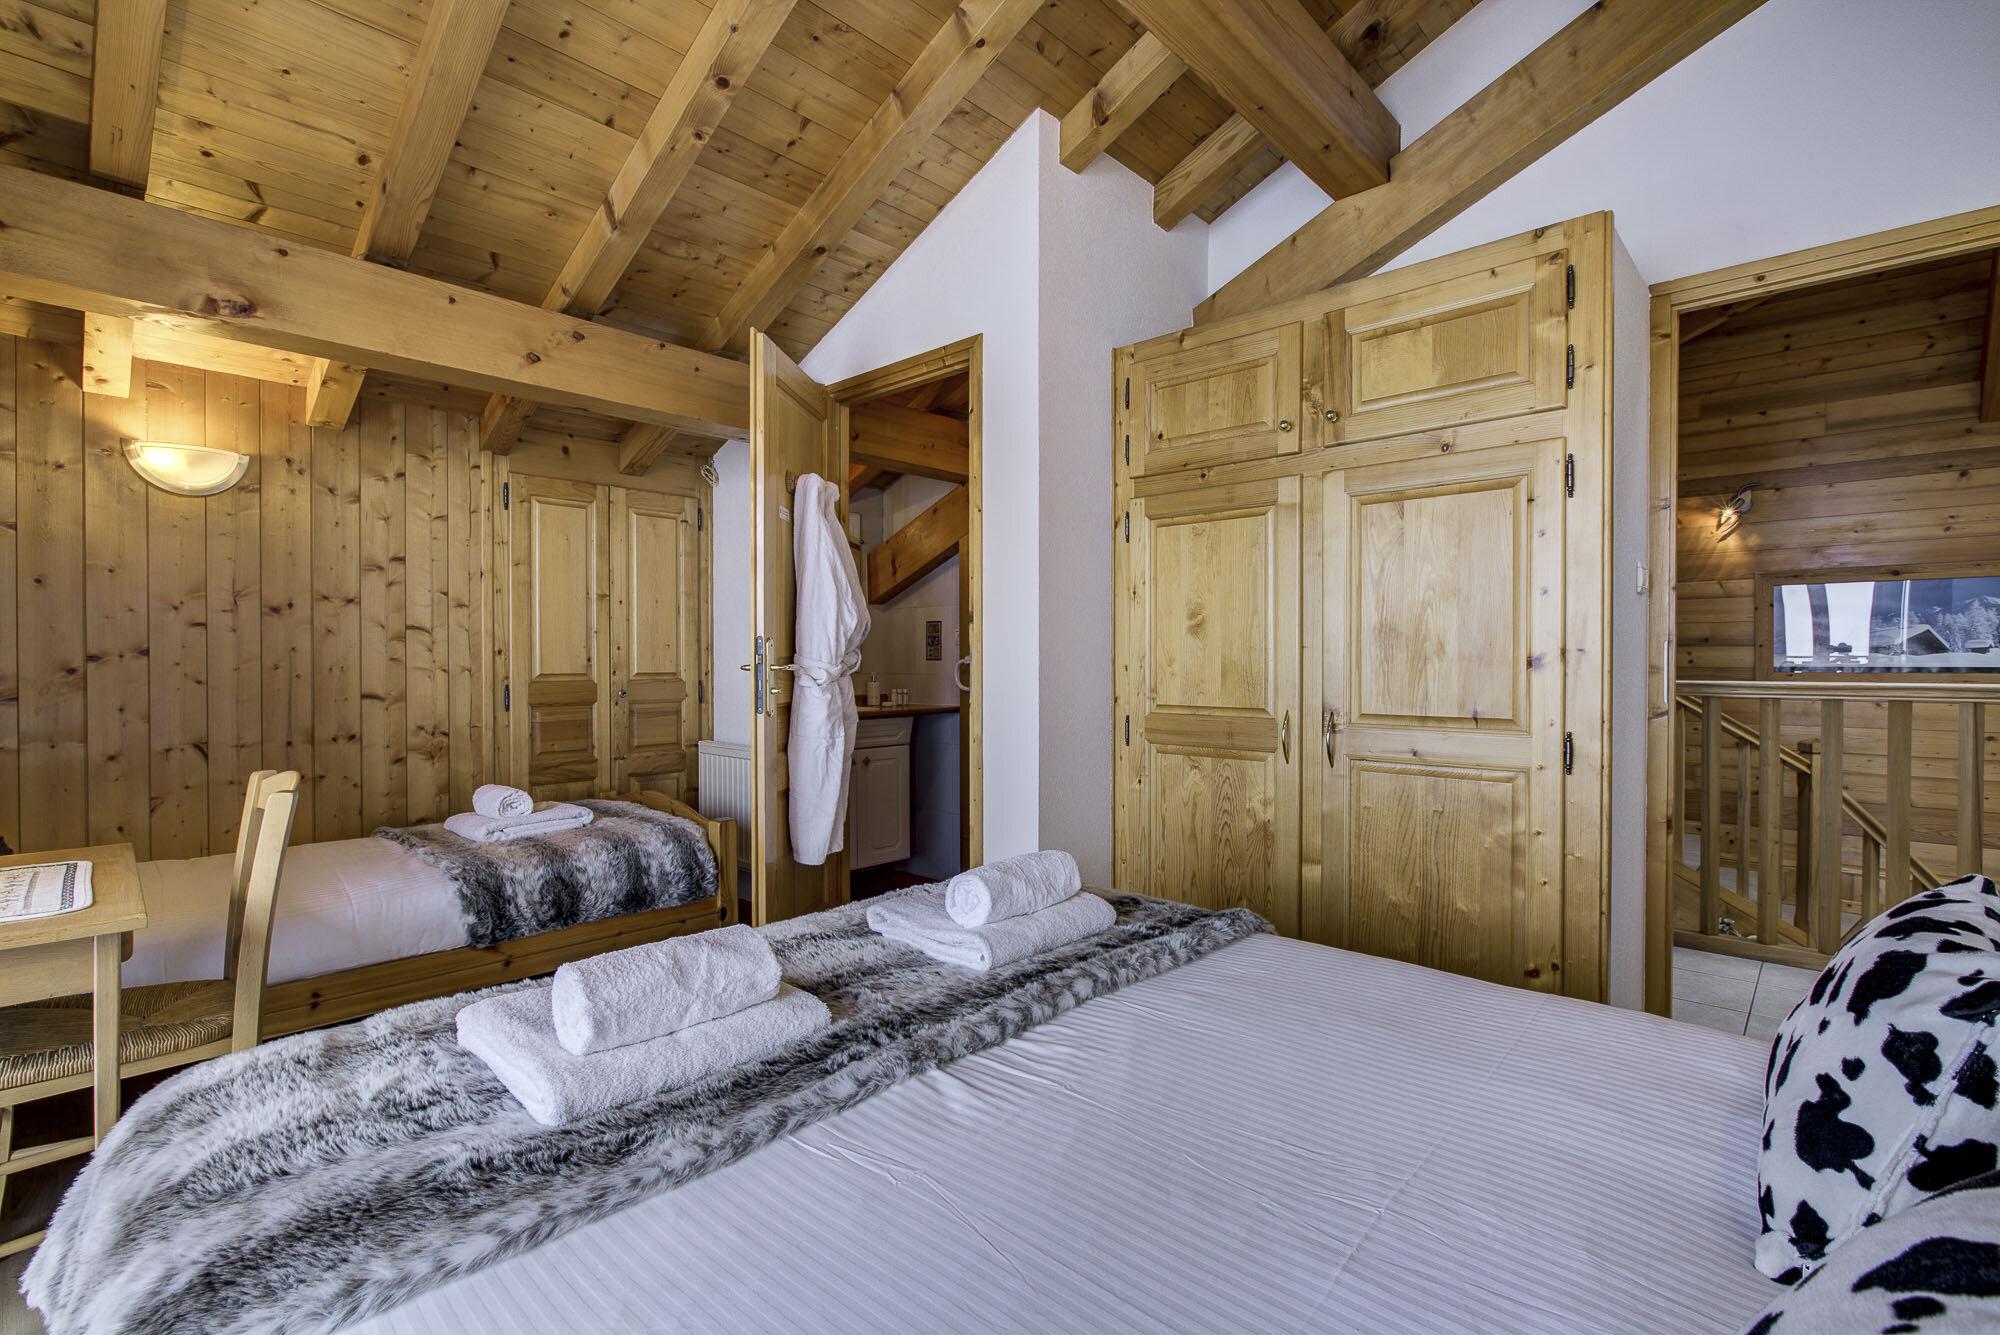 tg-ski-chalet-le-roc-soleil-morzine-011.jpg